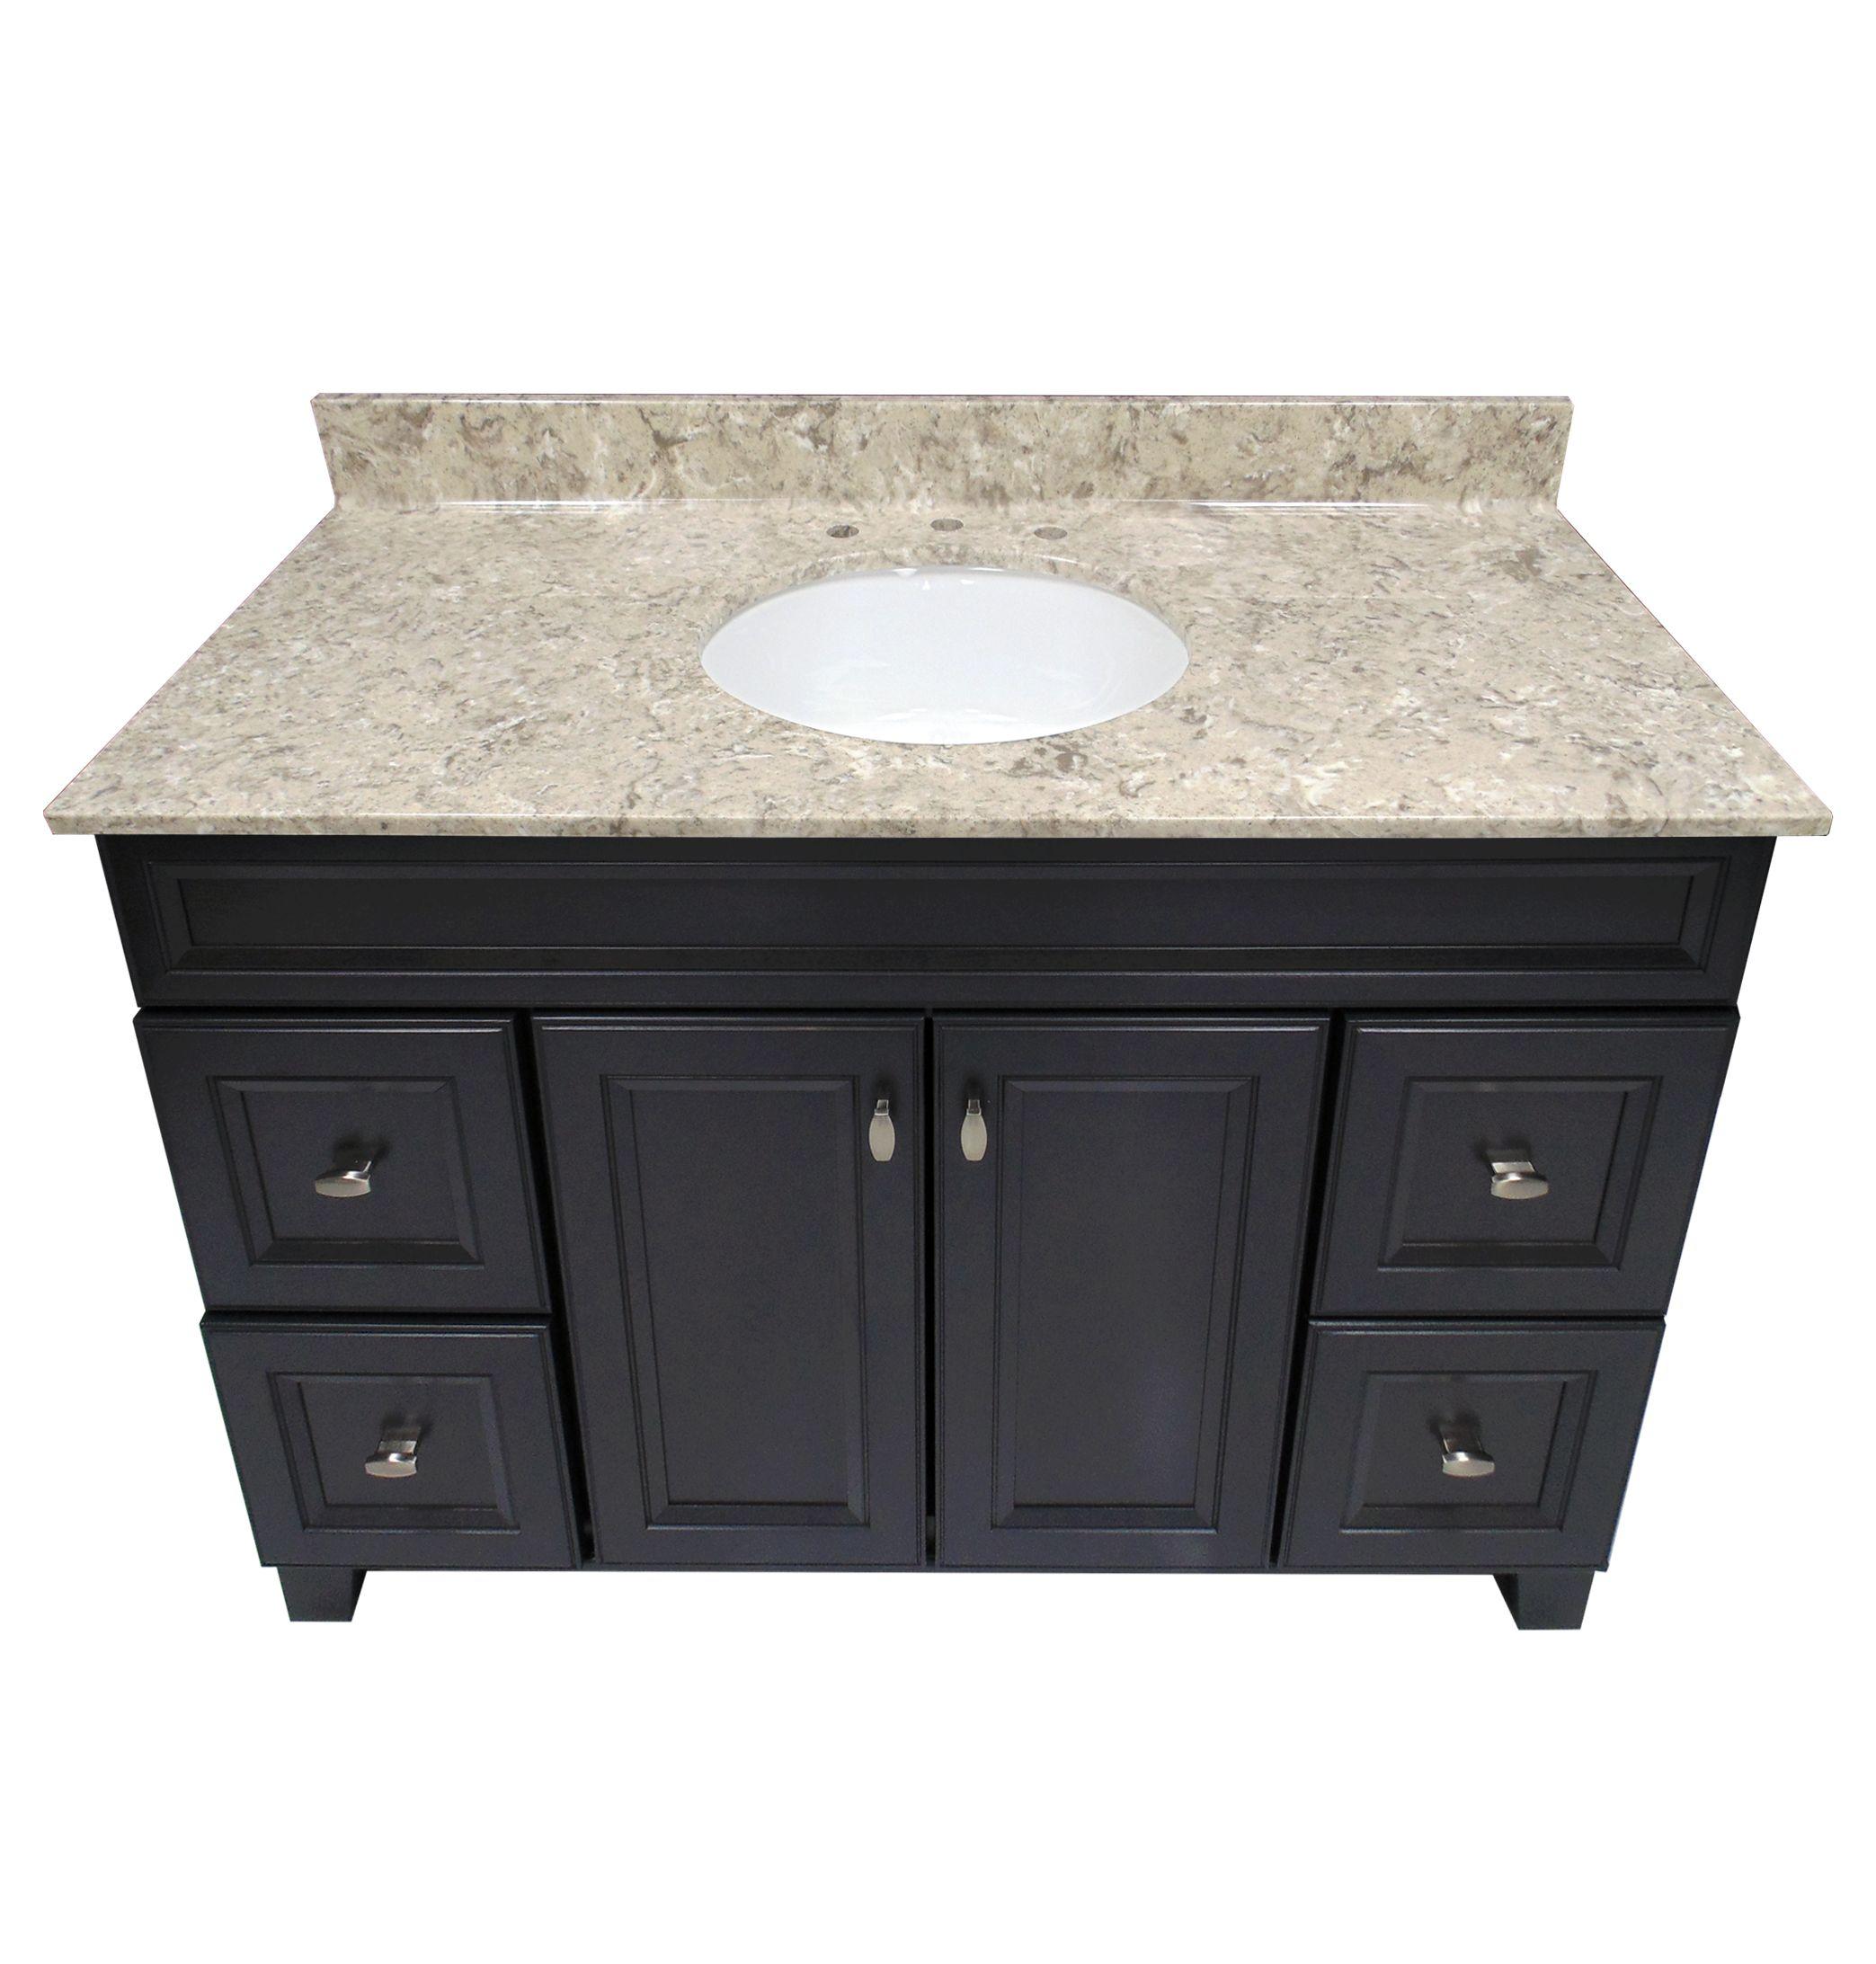 Us marble river bottom cultured veined granite vanity top - Cultured marble bathroom vanity tops ...